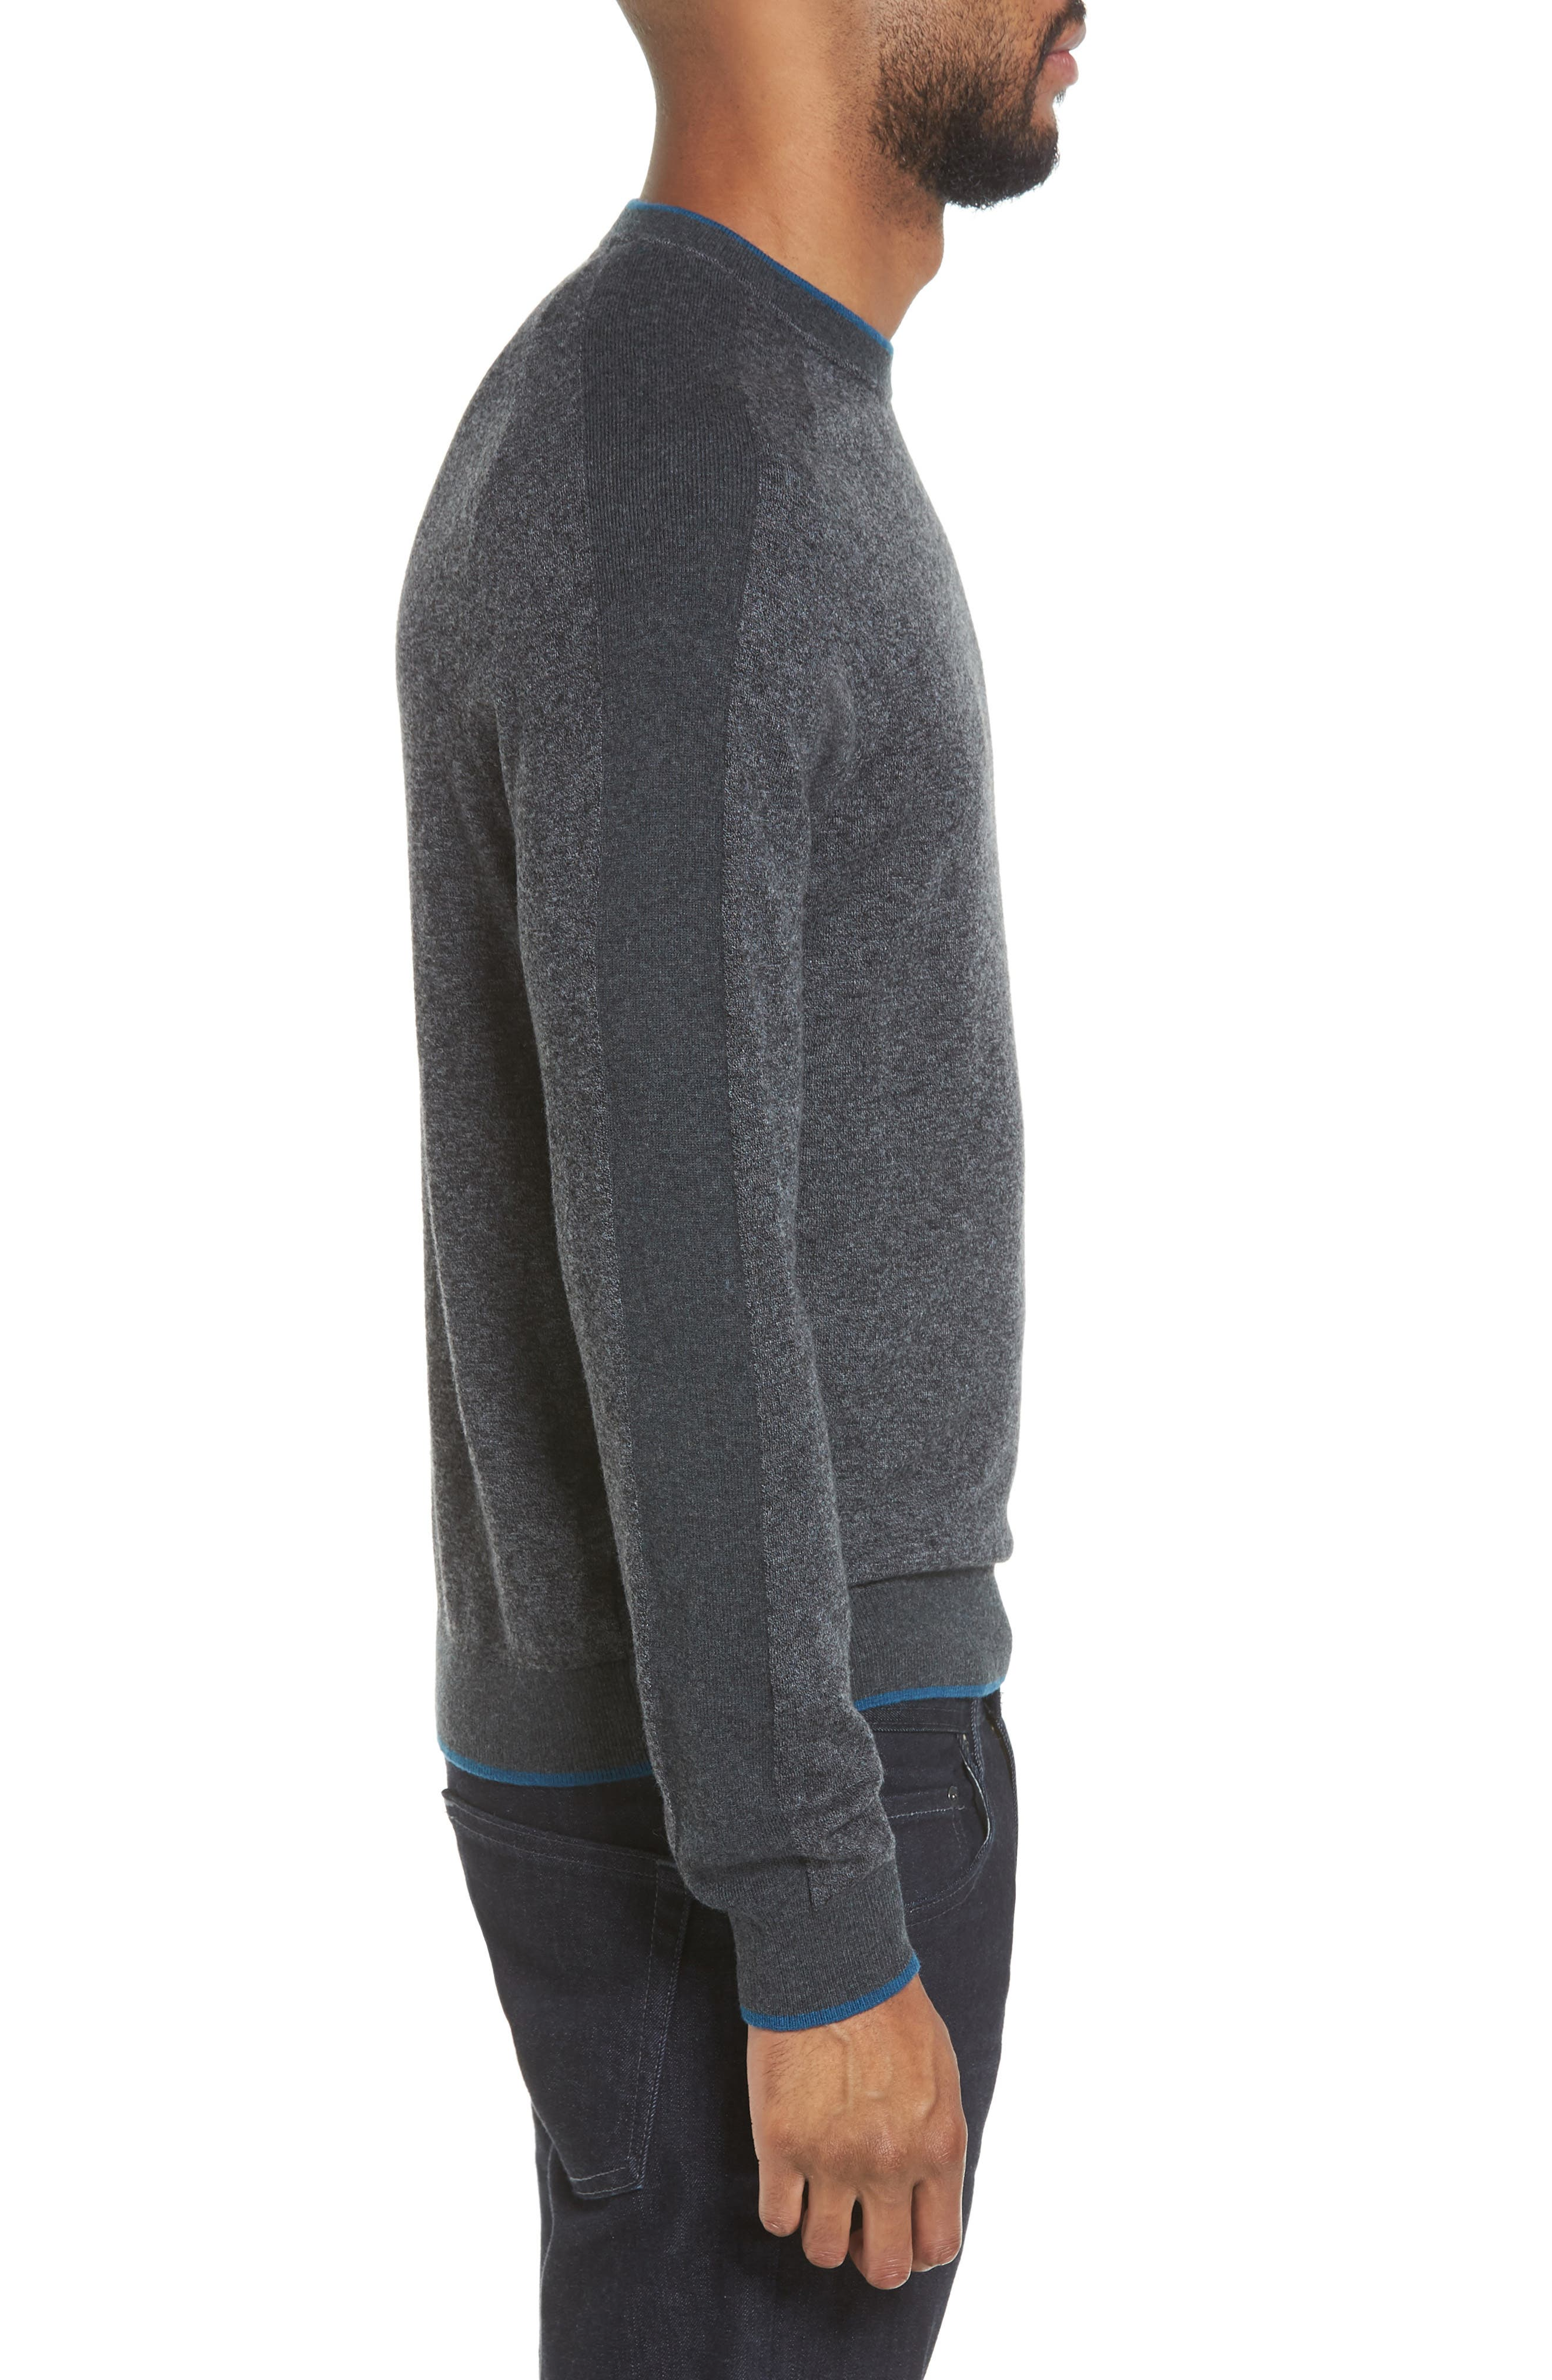 Norpol Crewneck Sweater,                             Alternate thumbnail 3, color,                             010